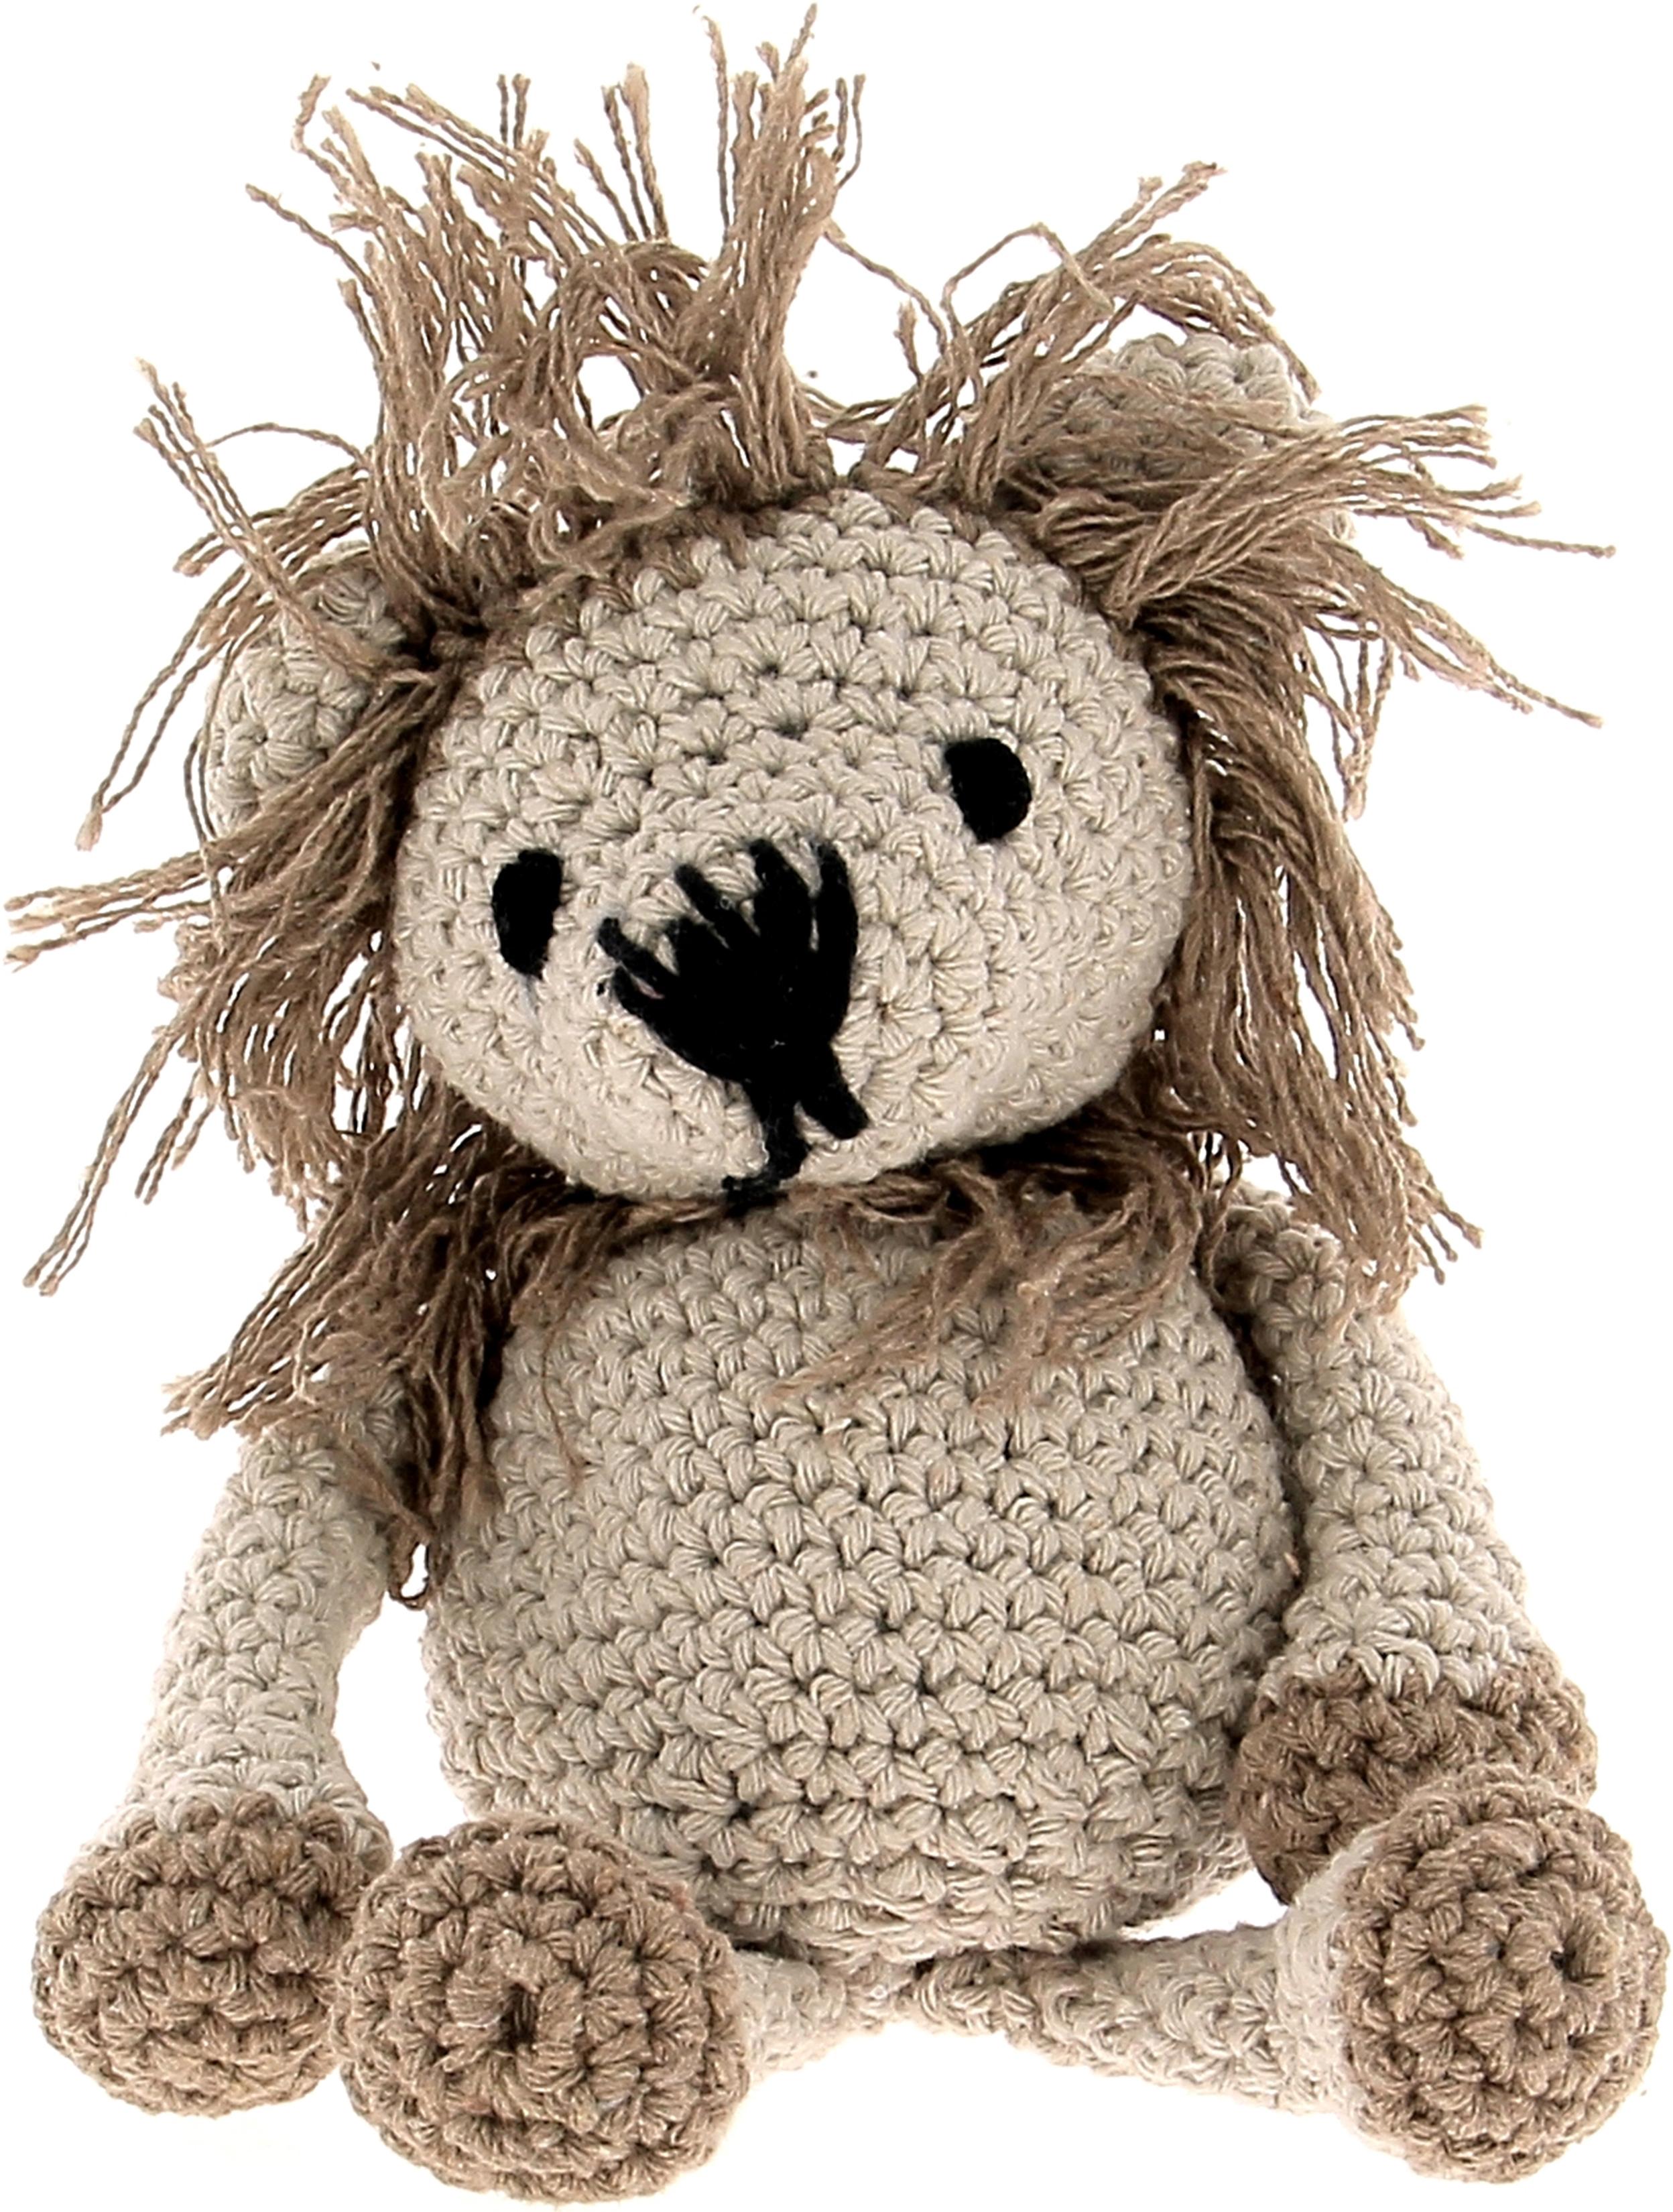 Hoooked Lion Leroy Yarn Kit W/Eco Barbante Yarn-Beige & Taupe